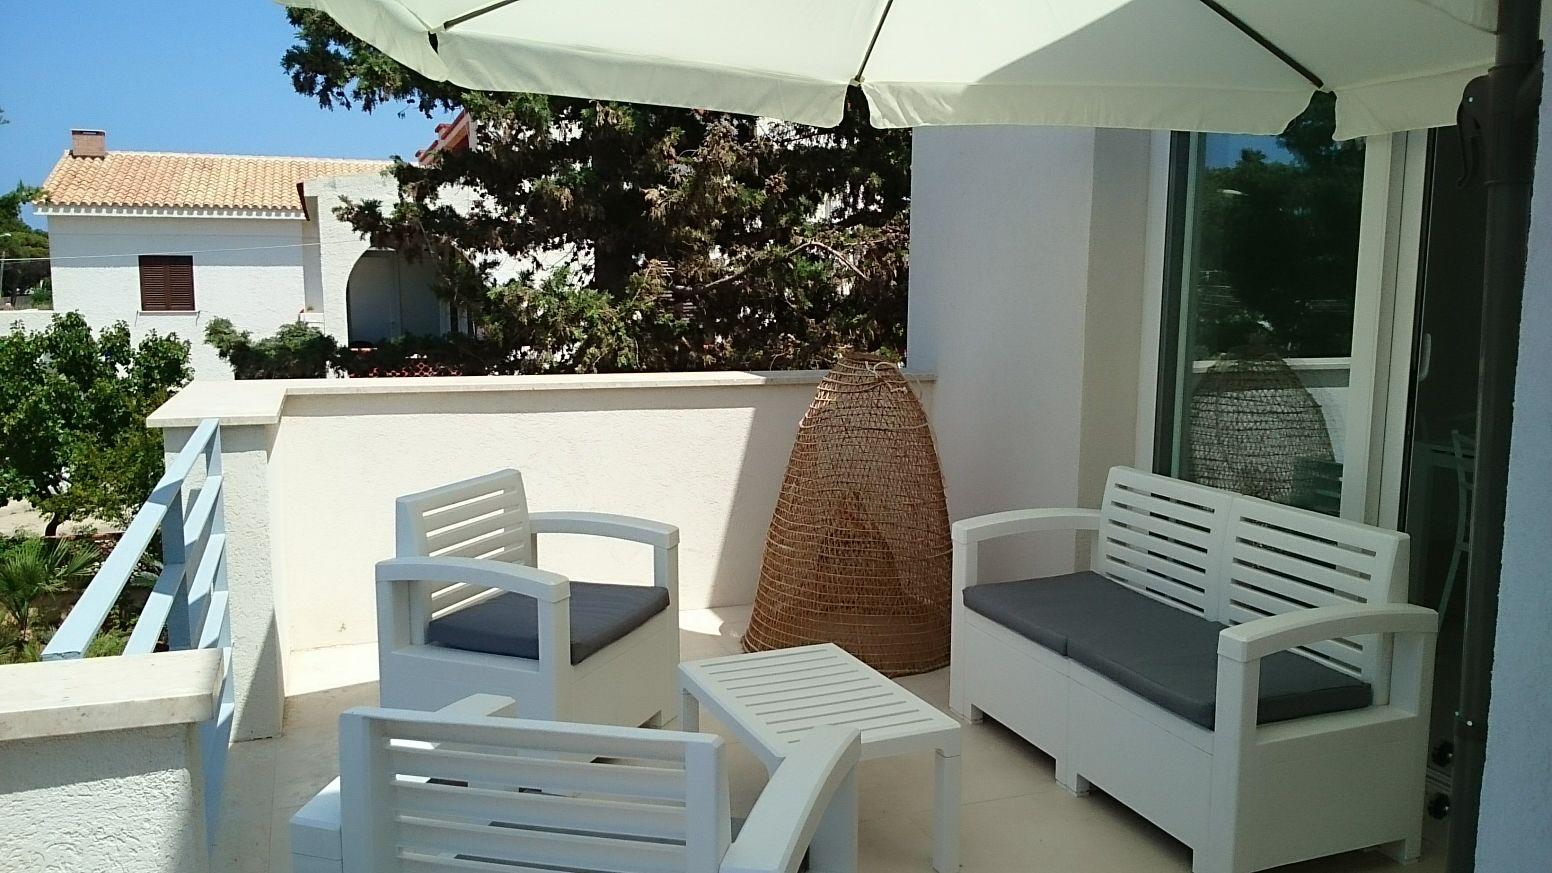 Sinatra_veranda